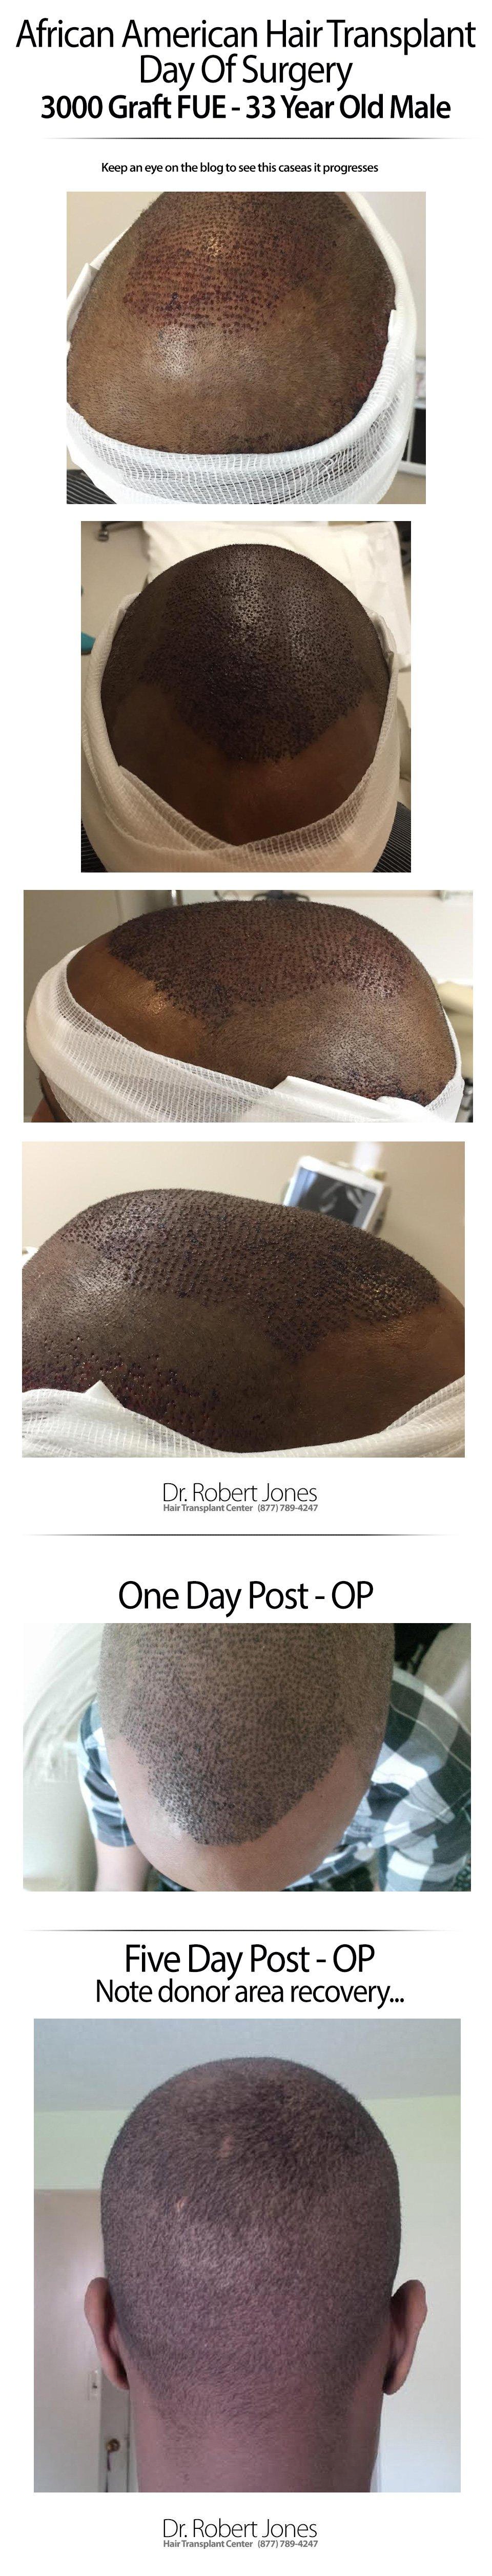 dr-jones-african-american-3000-graft-FUE-img-1